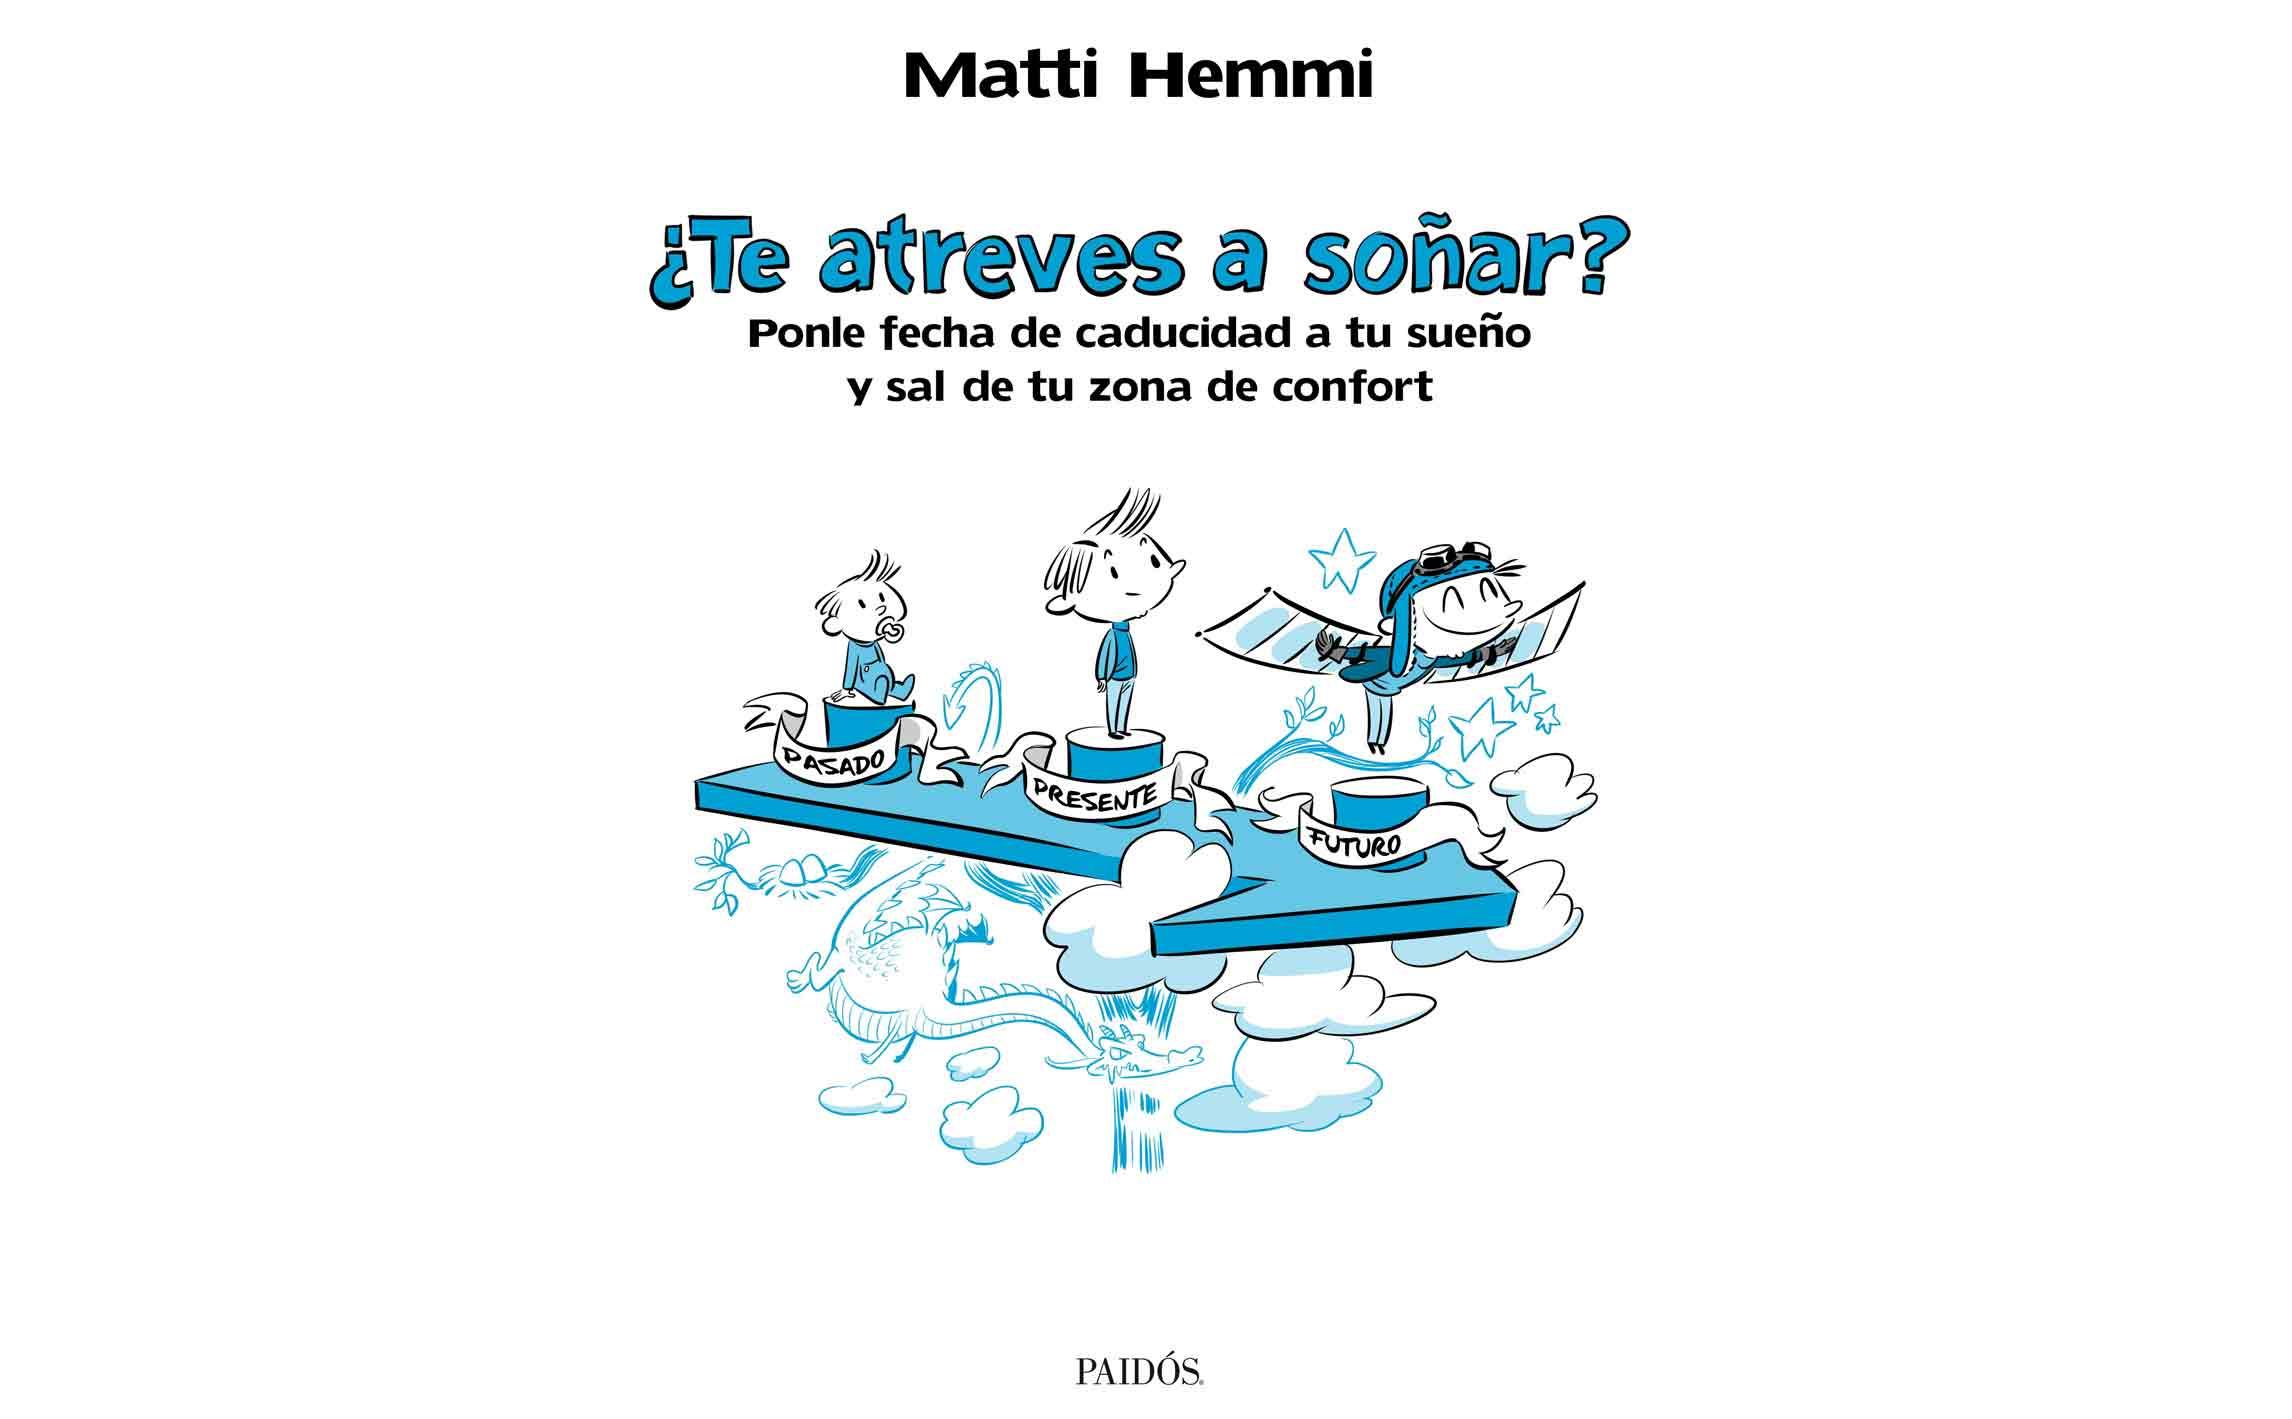 Libro: ¿Te atreves a soñar? – Matti Hemmi